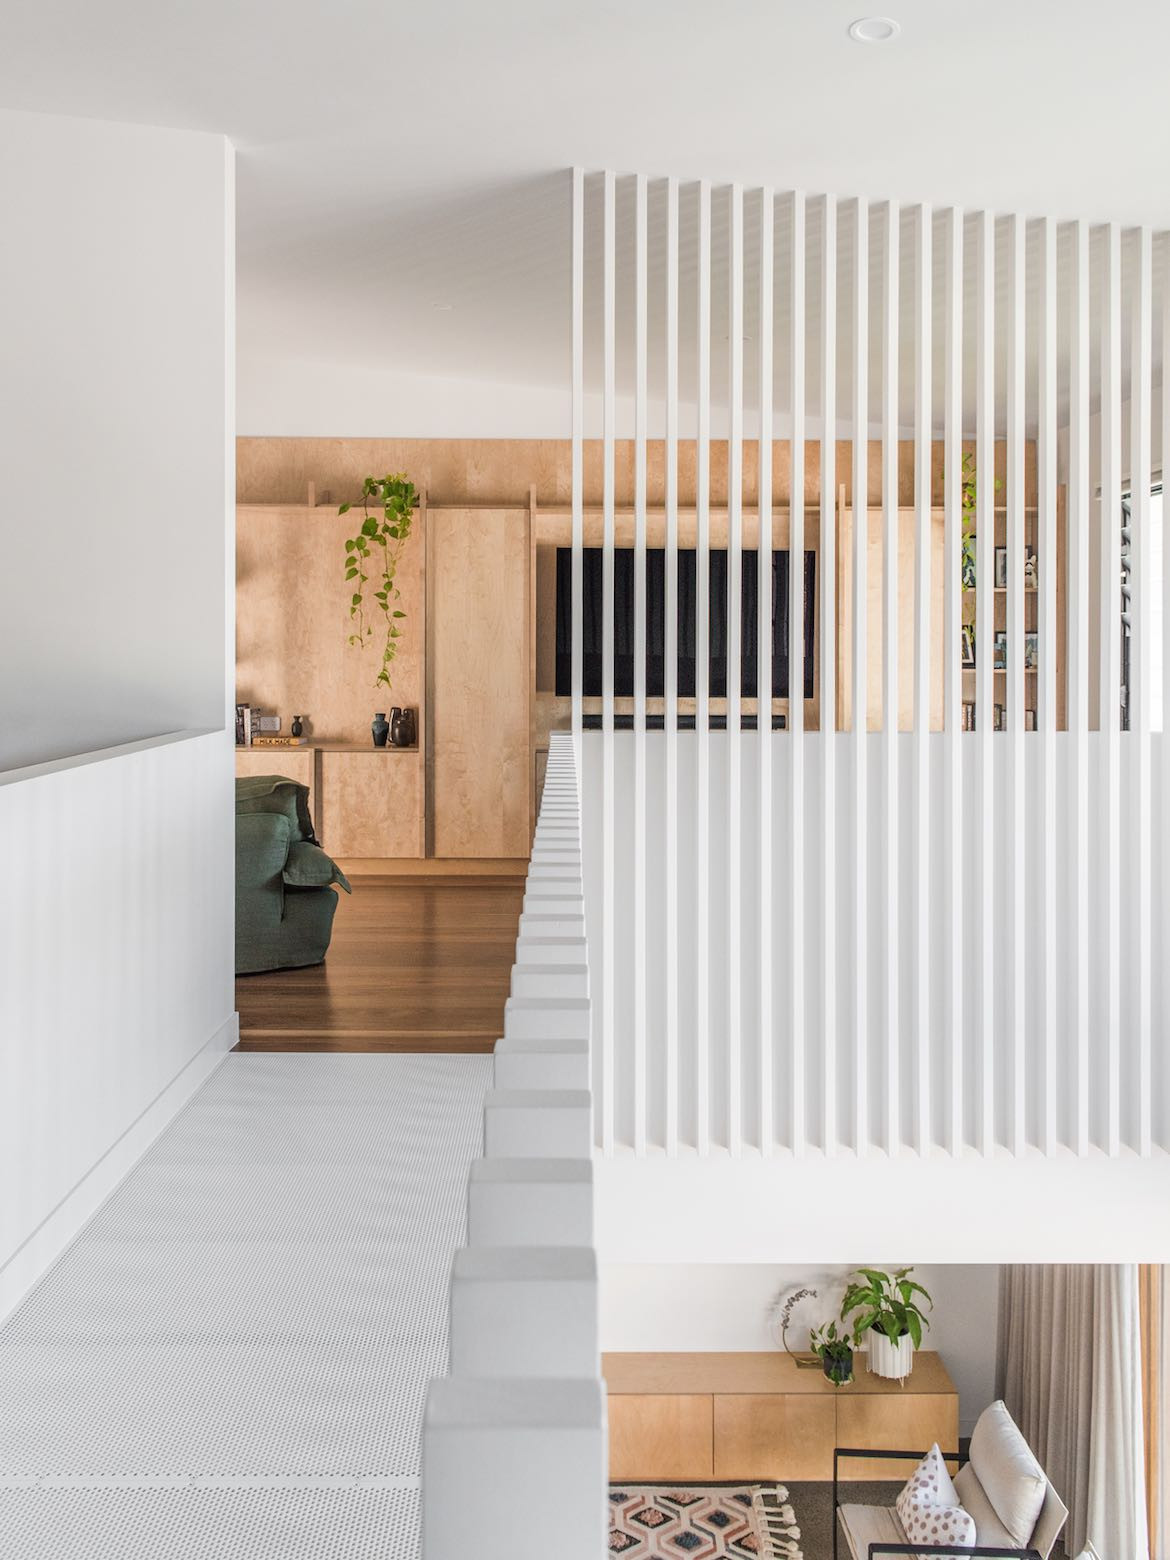 Vertical beams demarcate the upstairs living area.